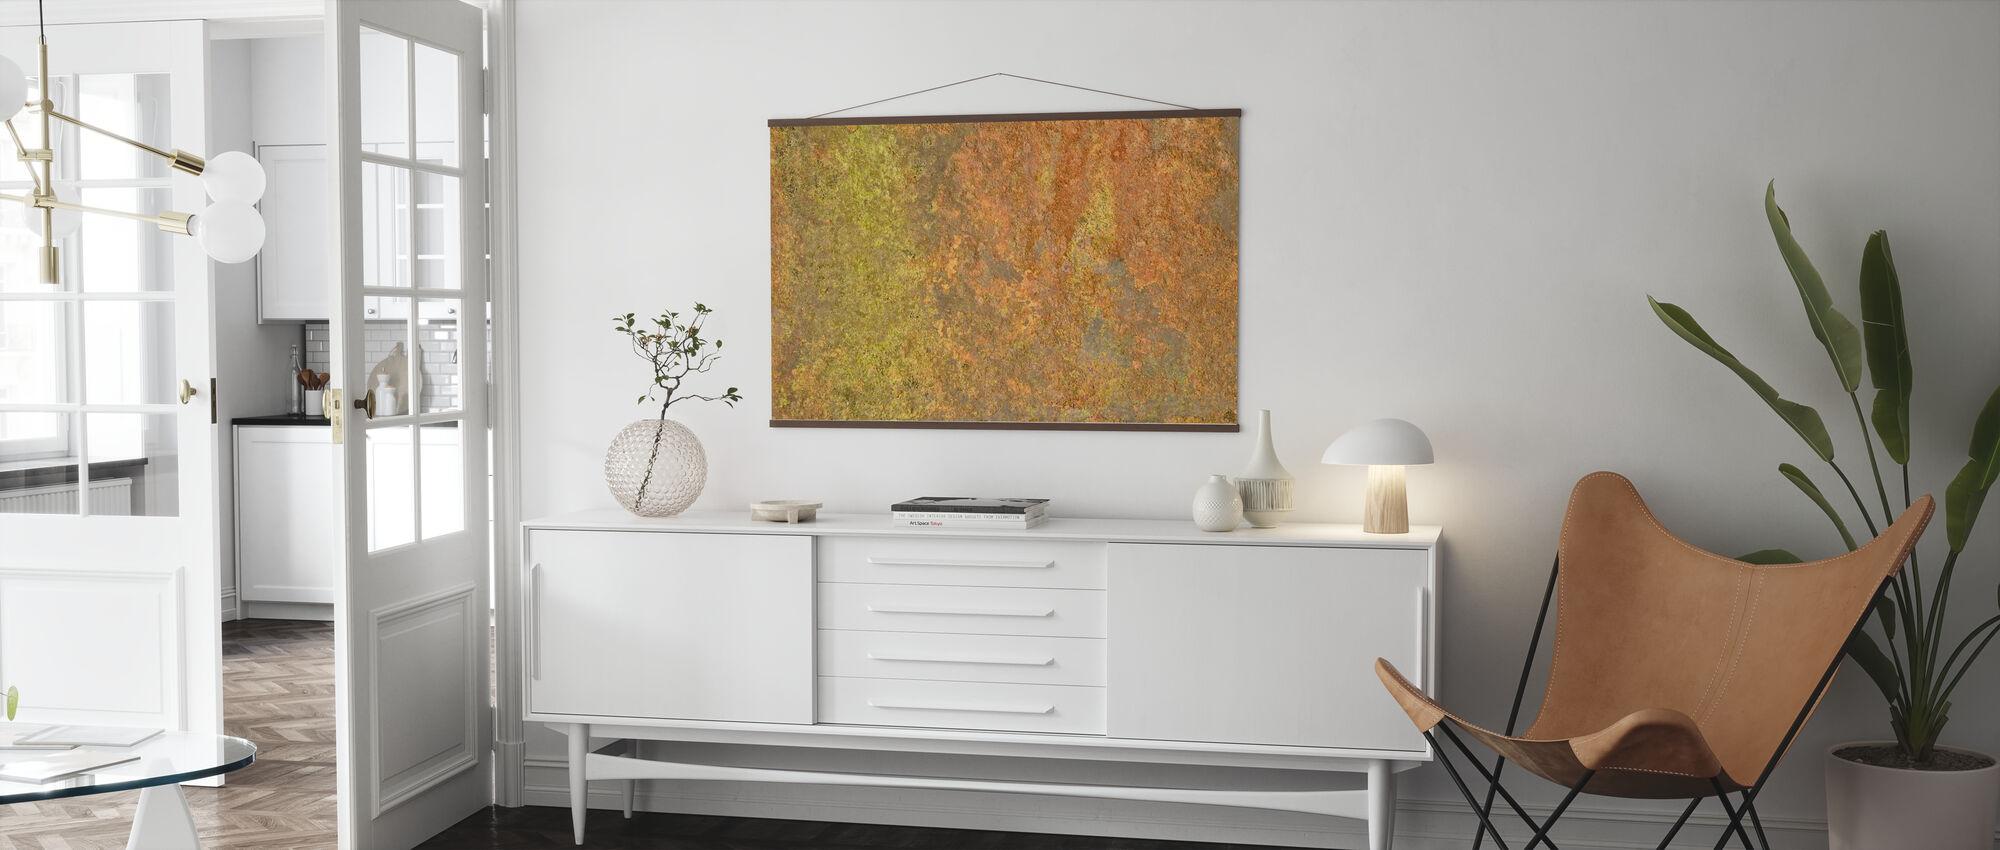 Metal Oxidation - Poster - Living Room